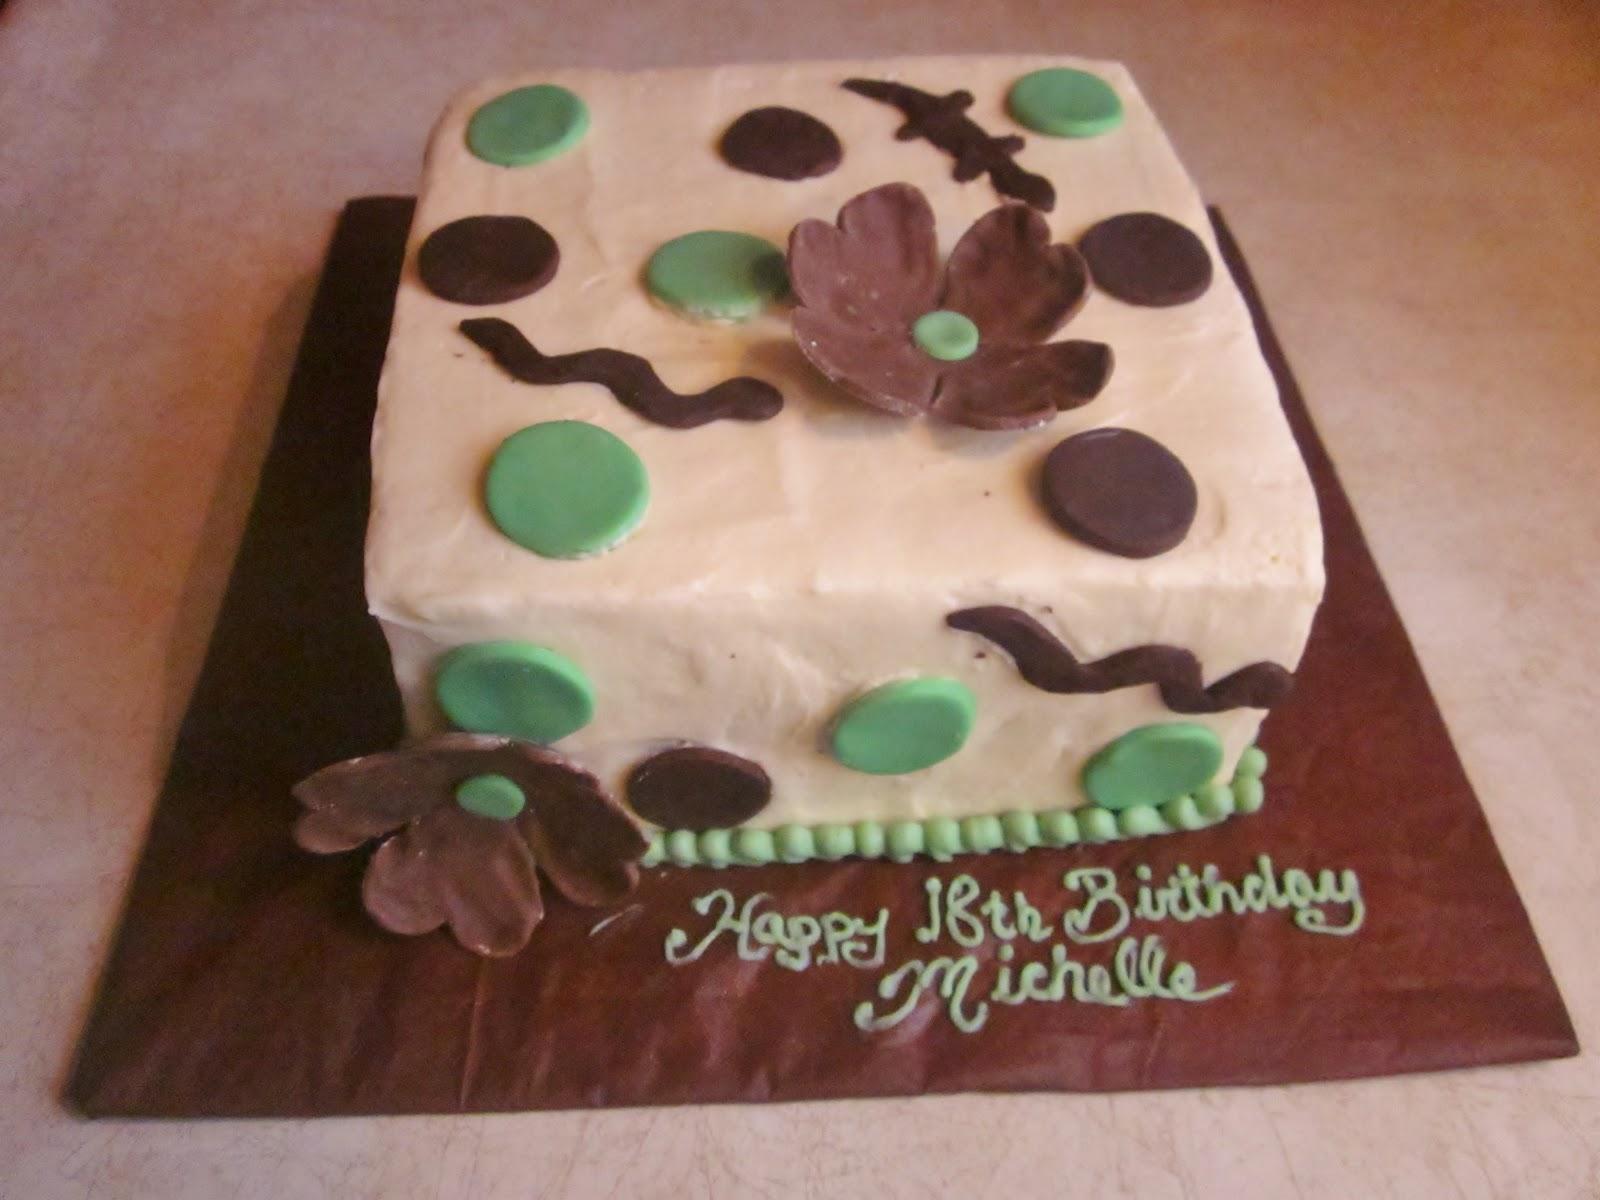 Second Generation Cake Design Snakes Lizards 18th Birthday Cake